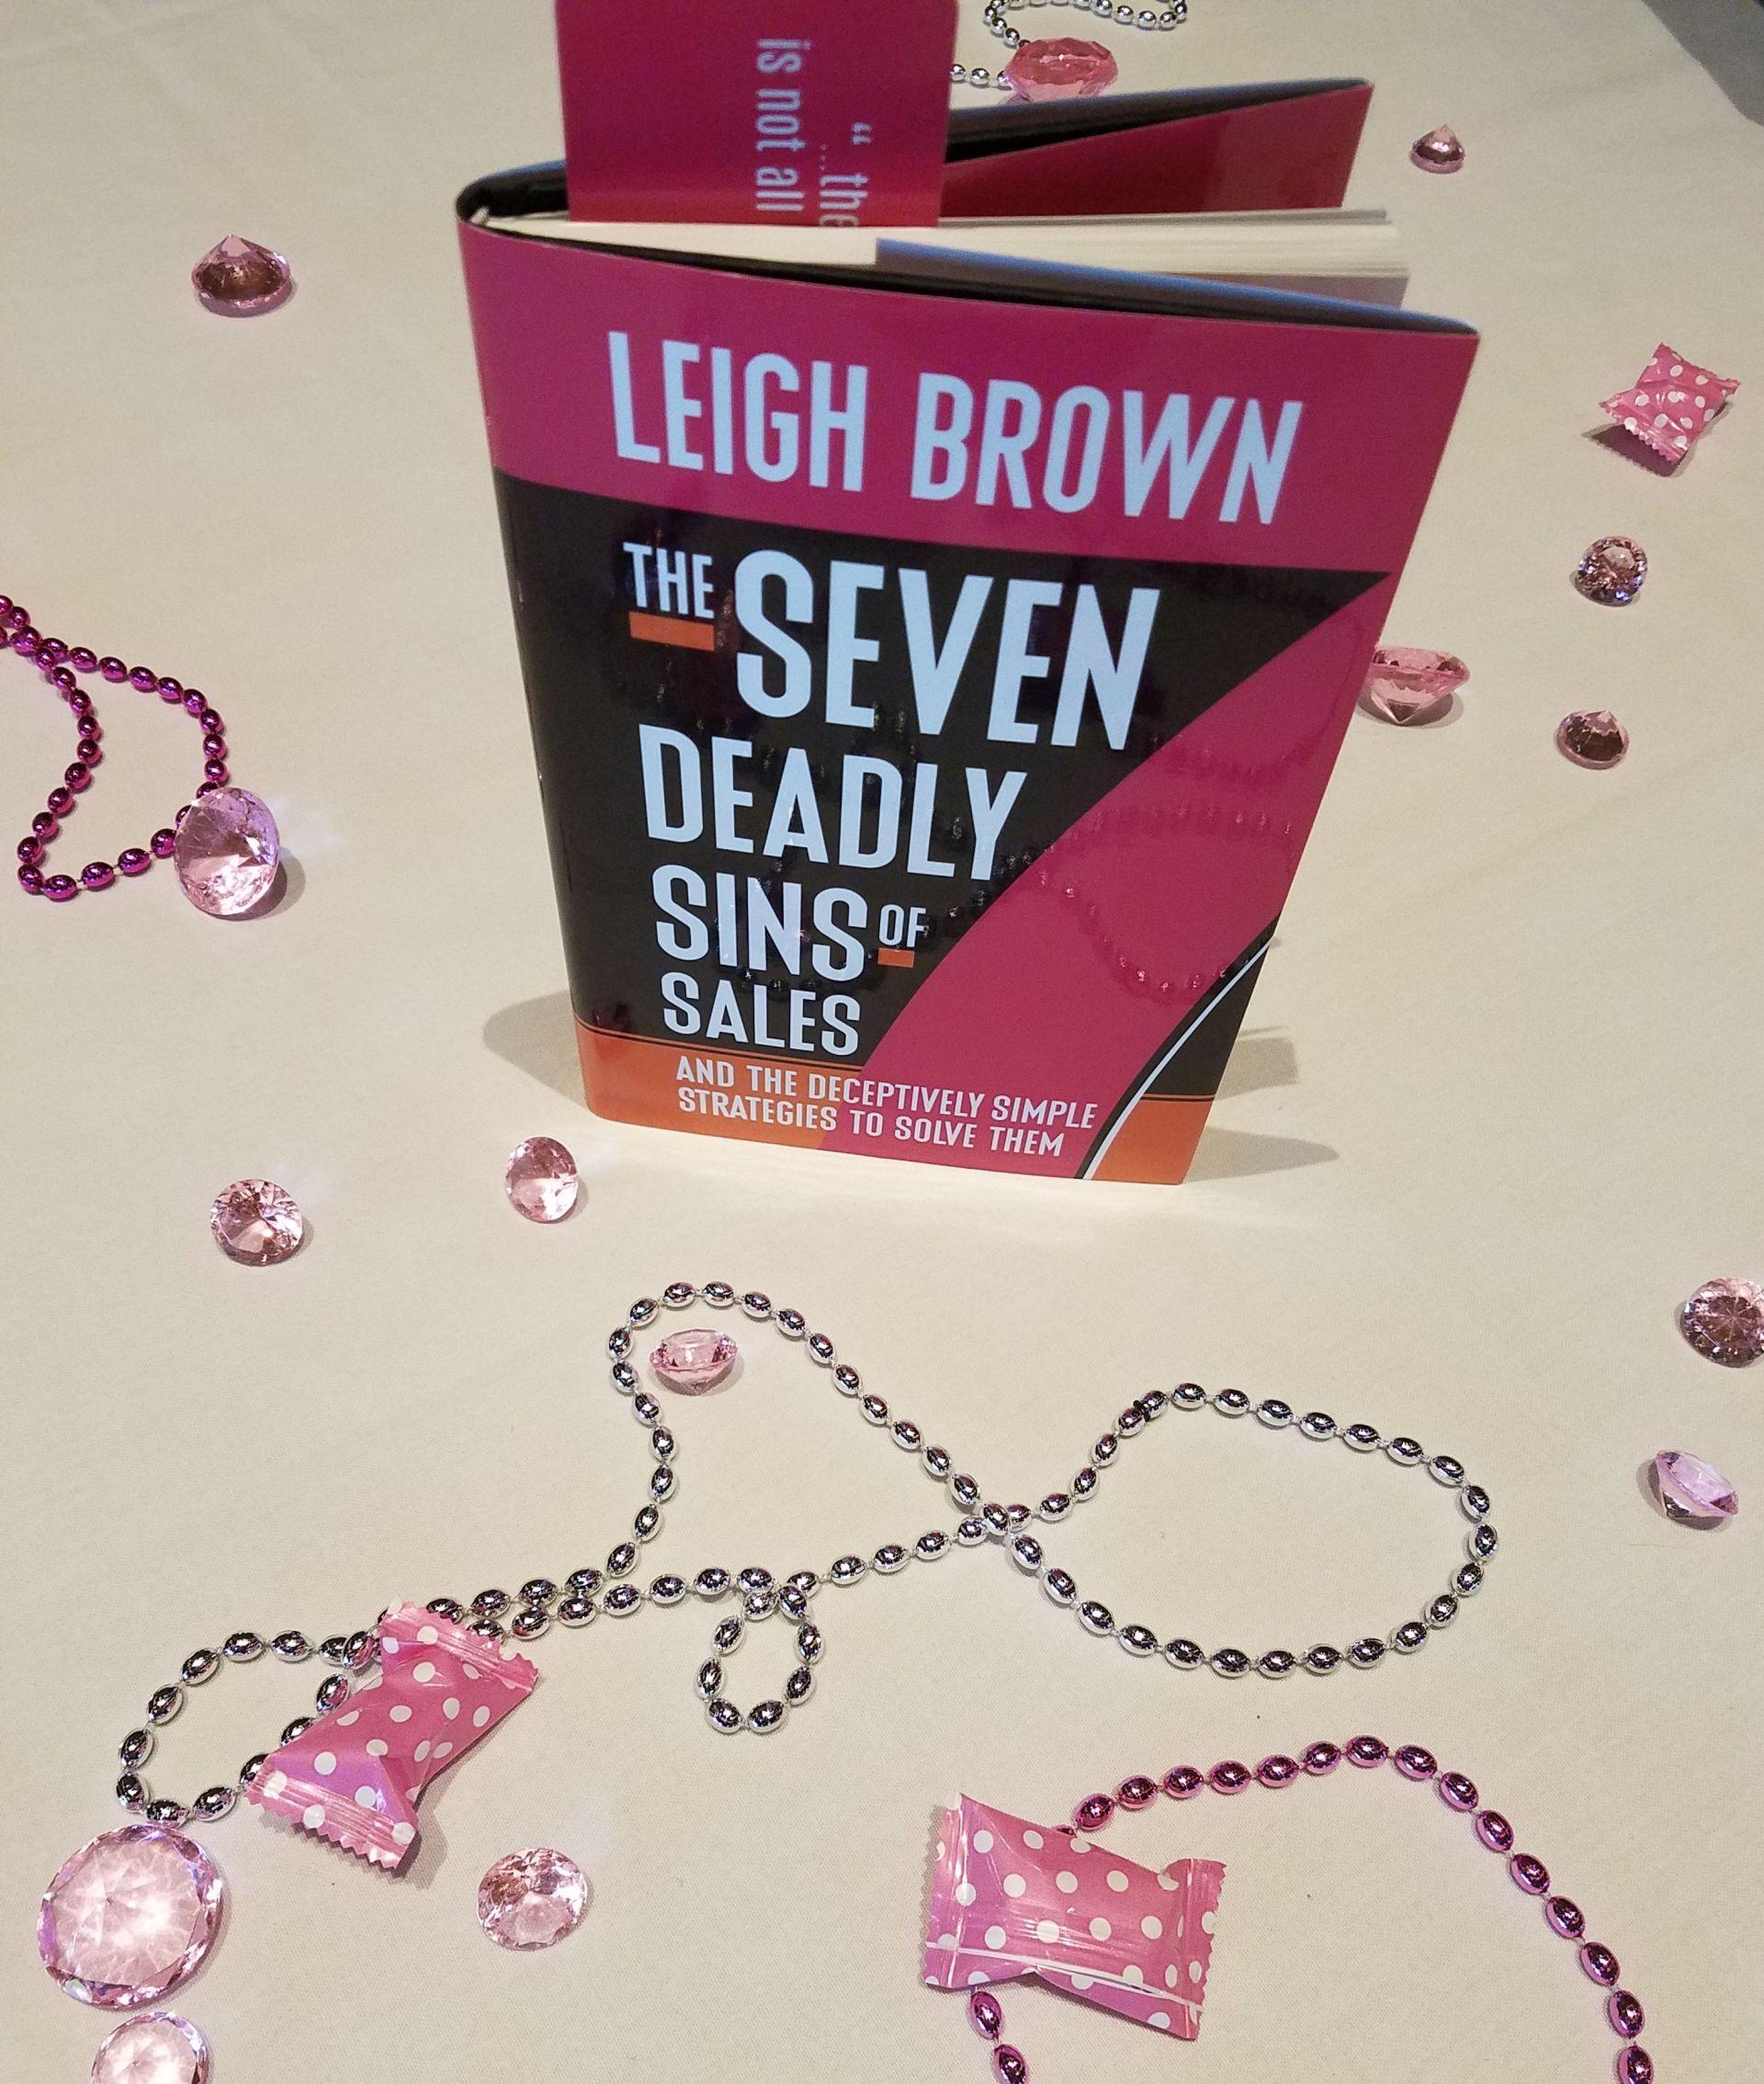 RPAC presents Leigh Brown